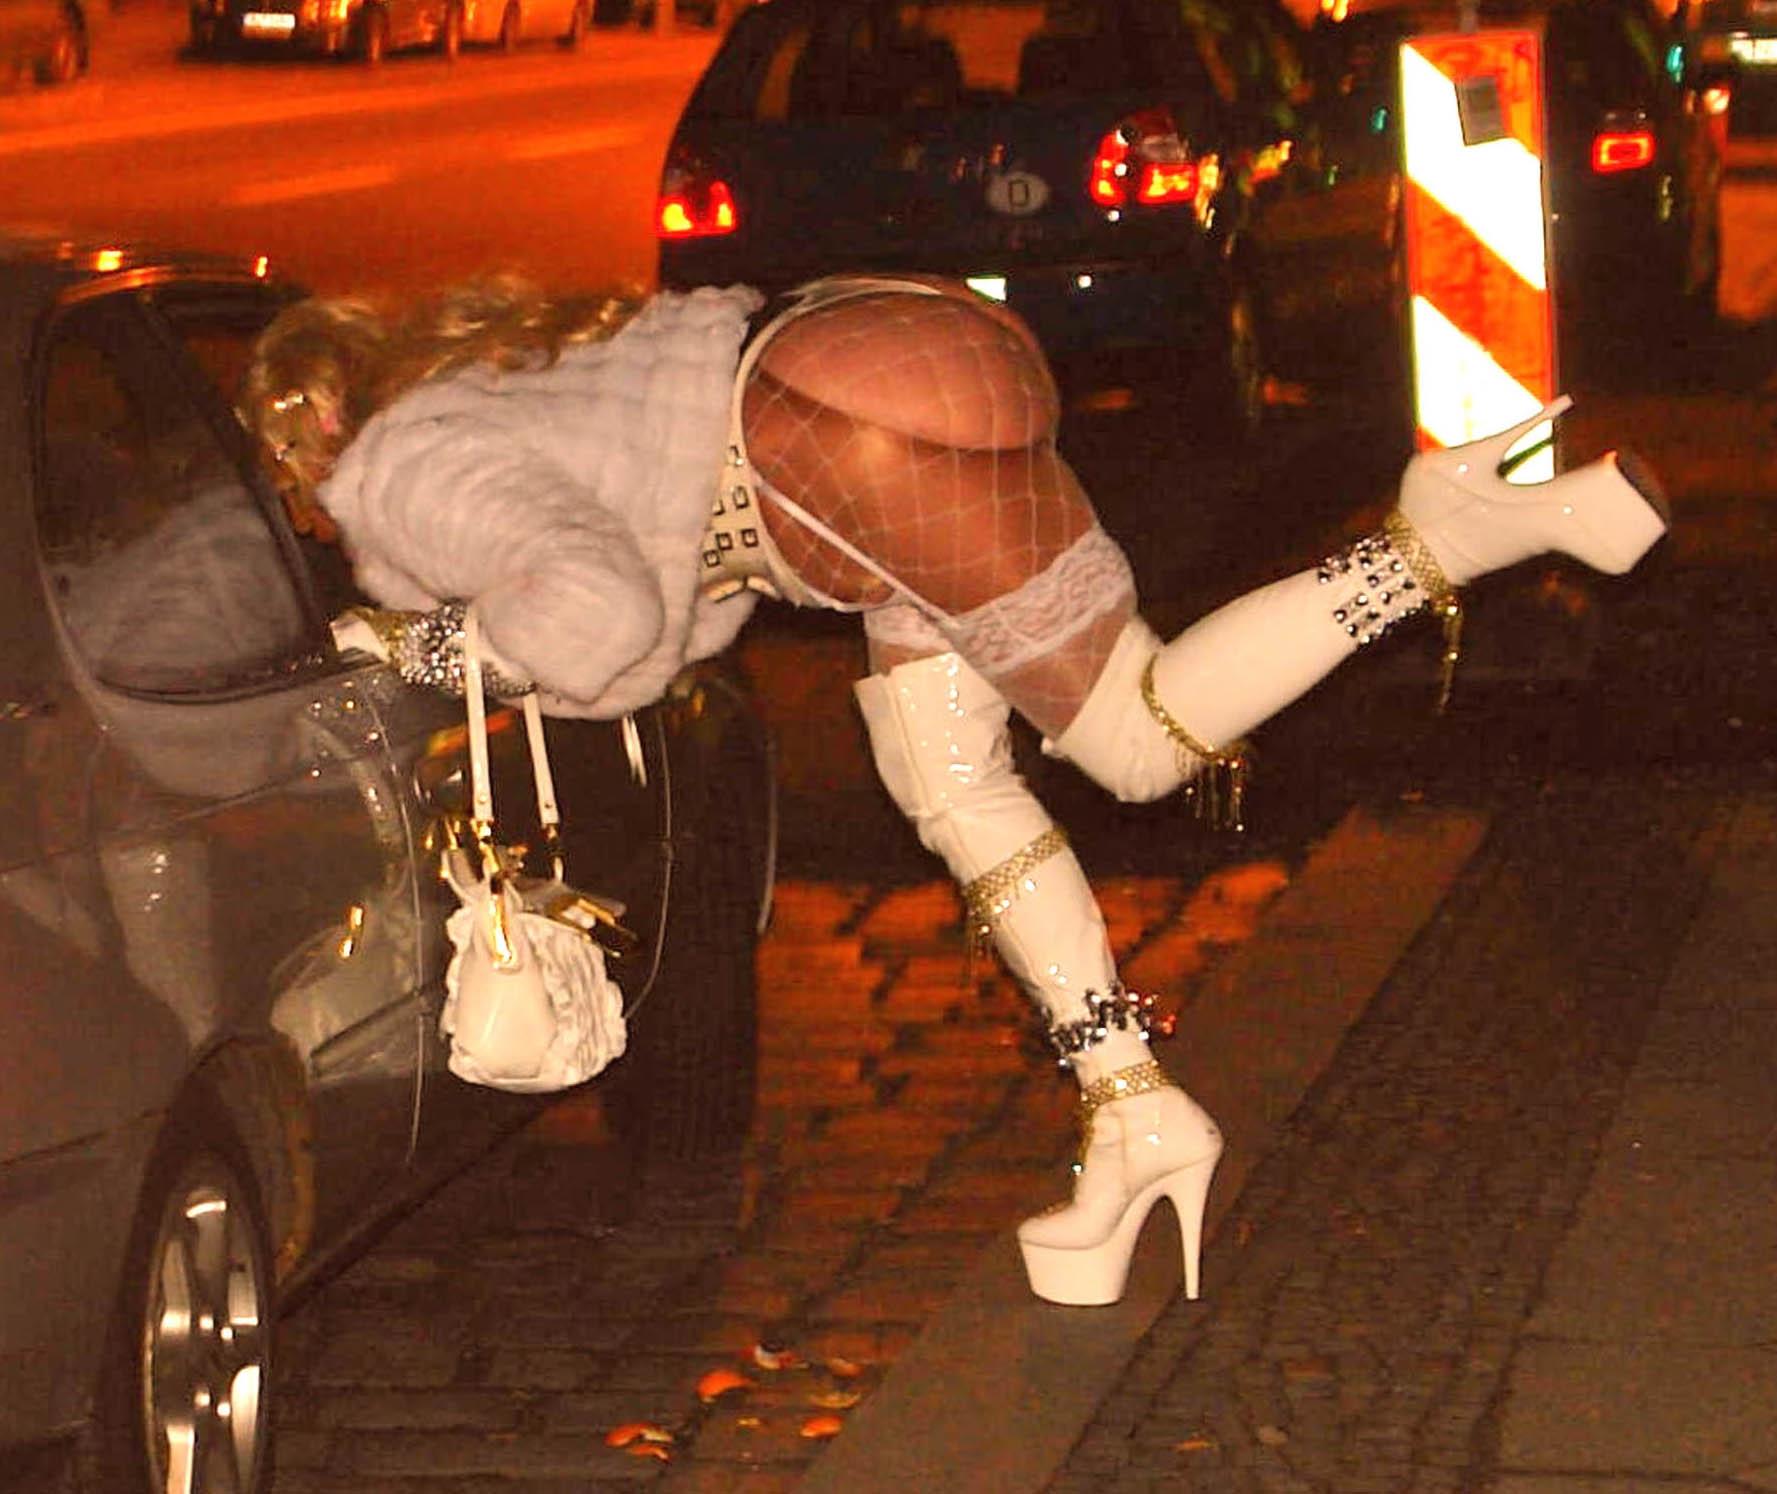 prostitution in helsinki finland erotiikka dvd